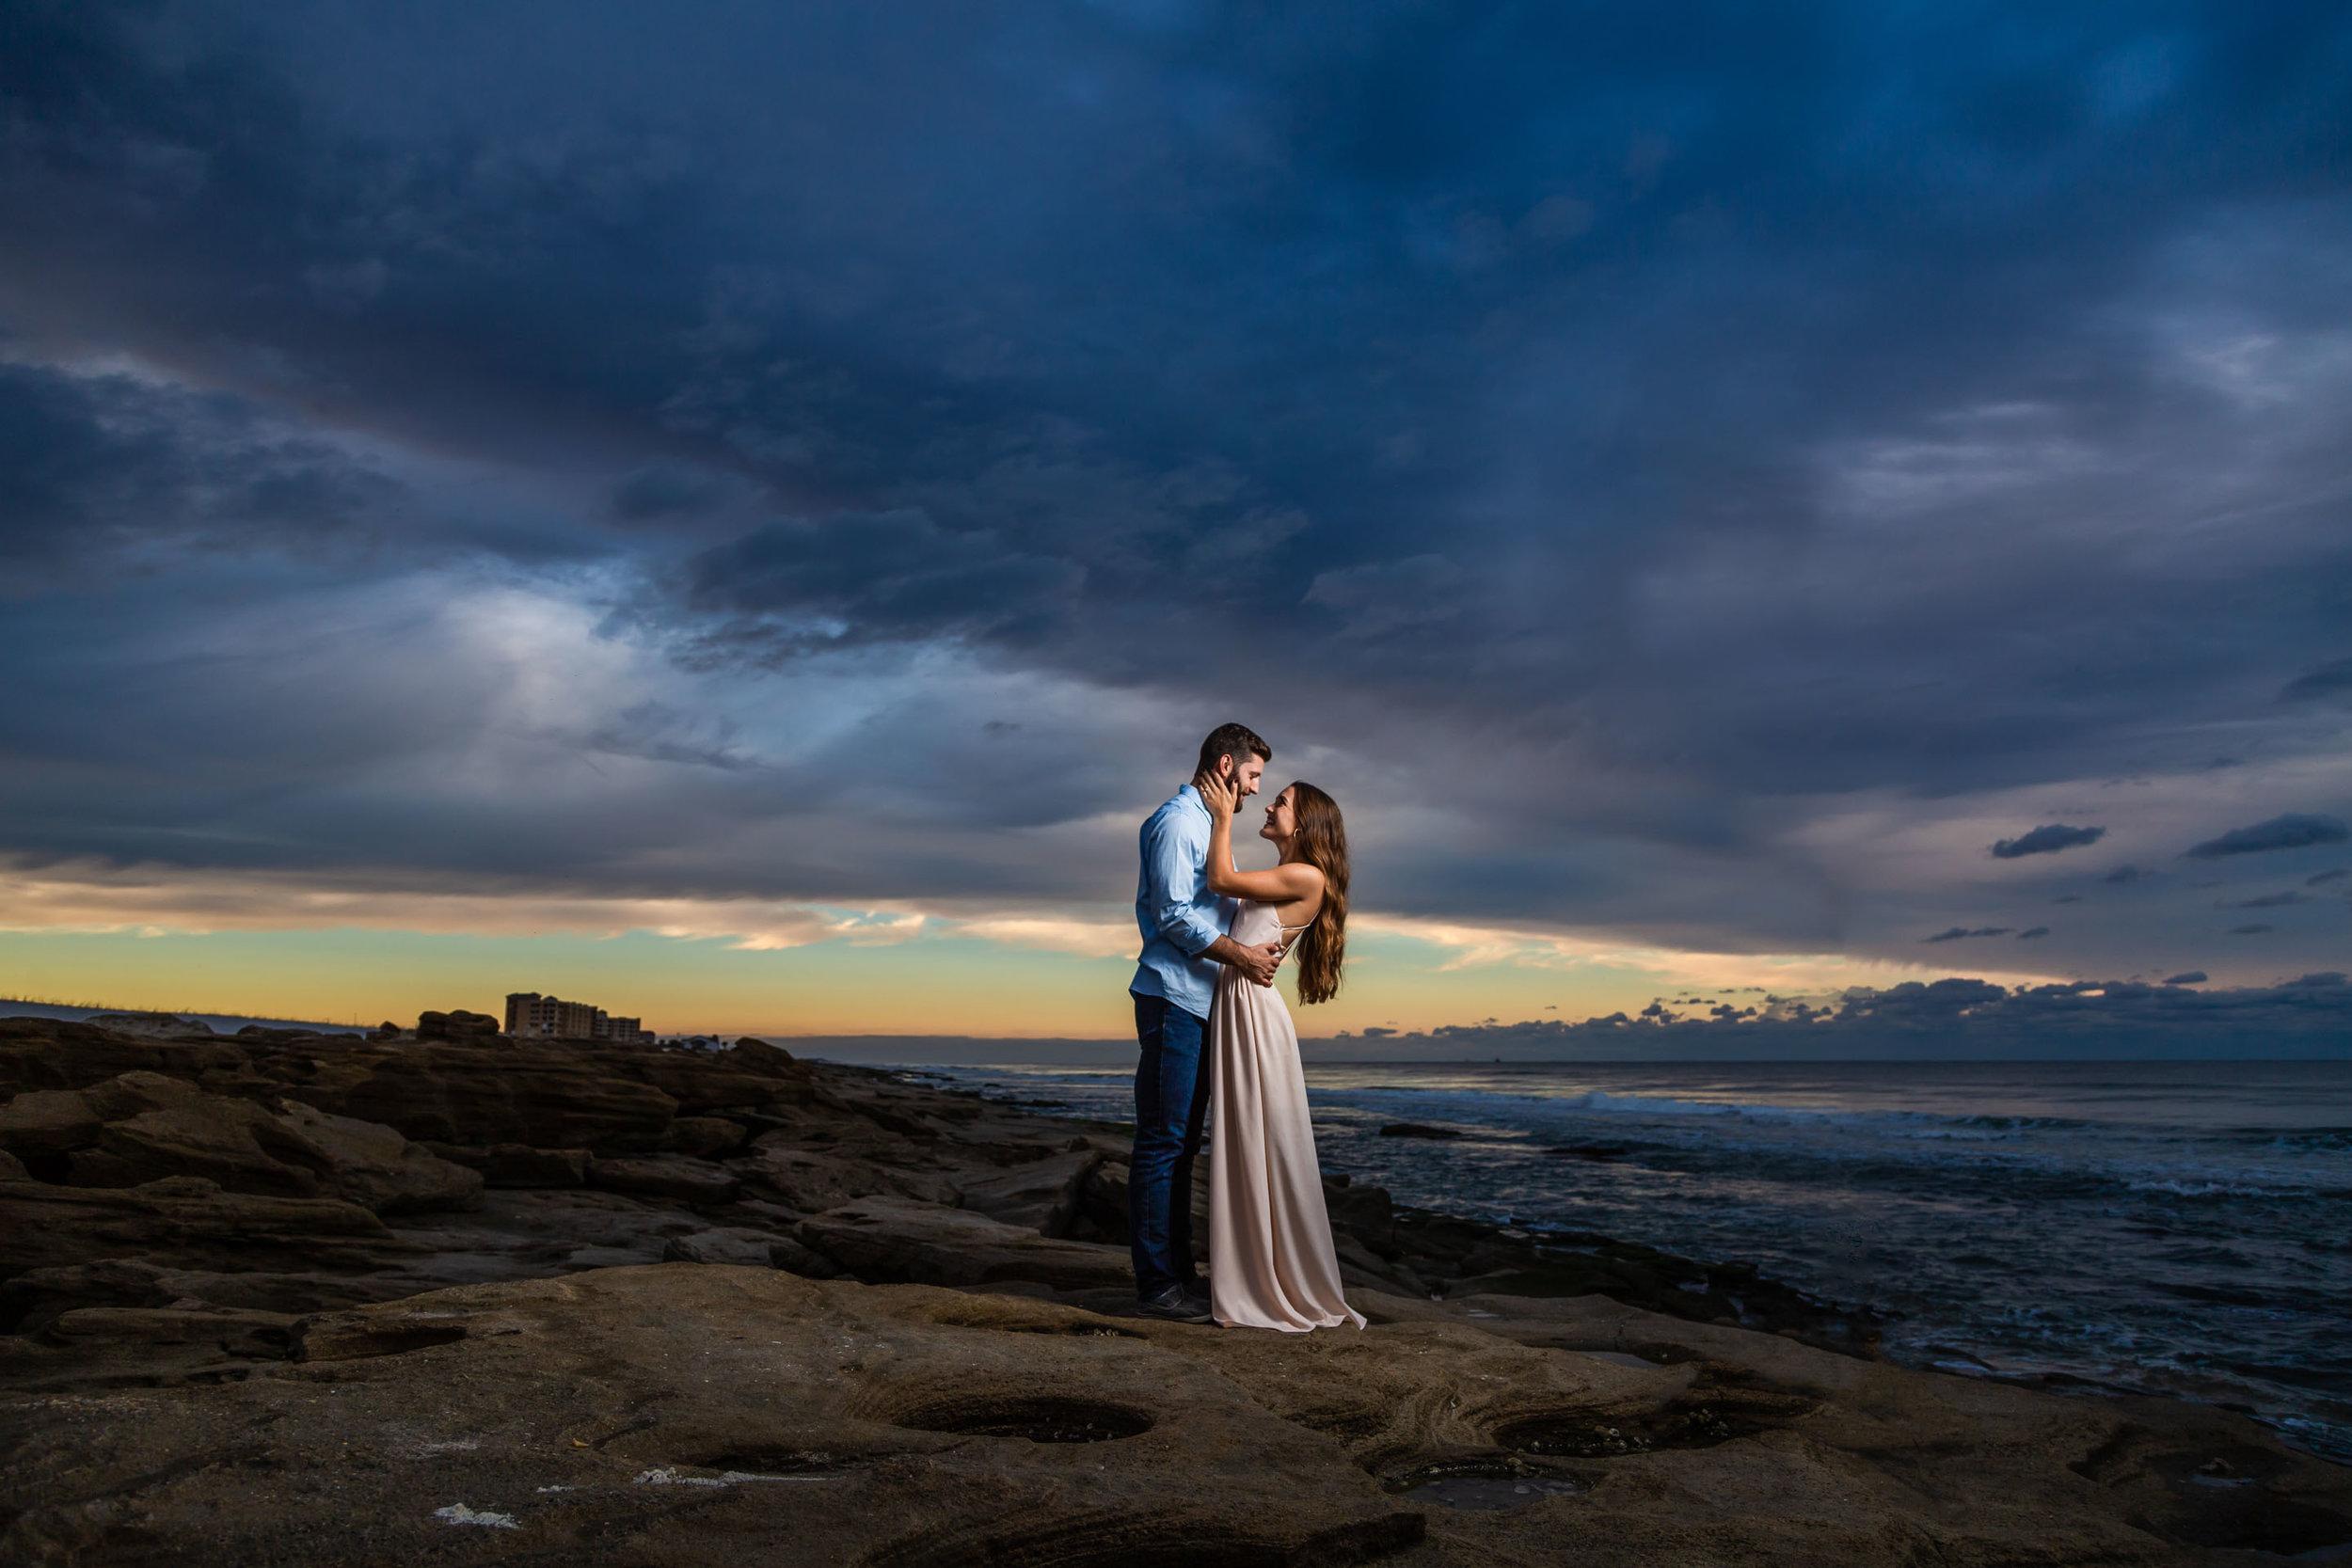 adam-szarmack-jacksonville-wedding-photographer-palm-coast-washing-oaks-garden-state-park-engagement-44.jpg